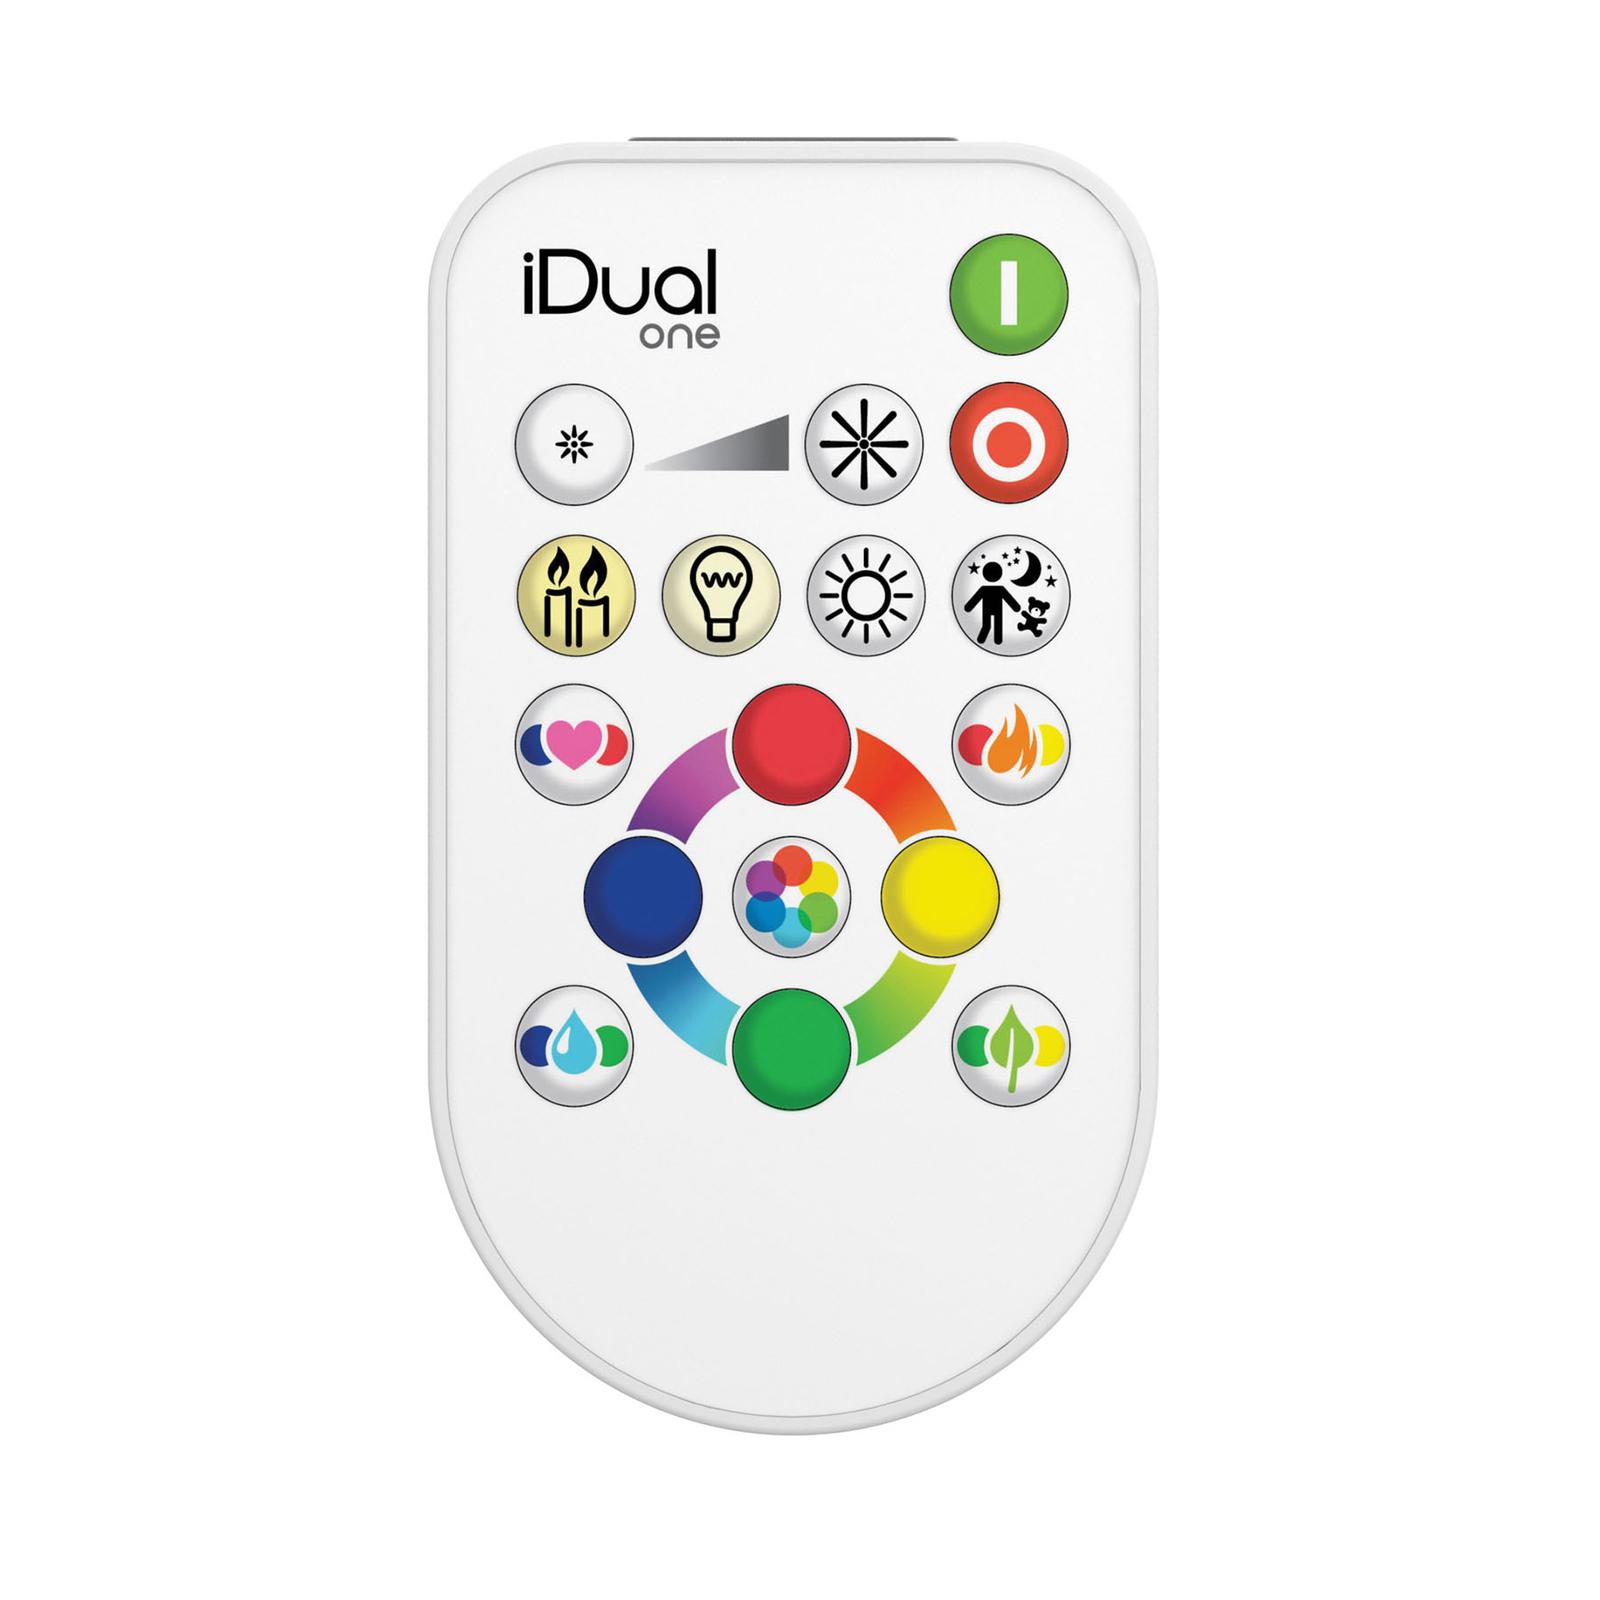 iDual control remoto One Flat RGBW